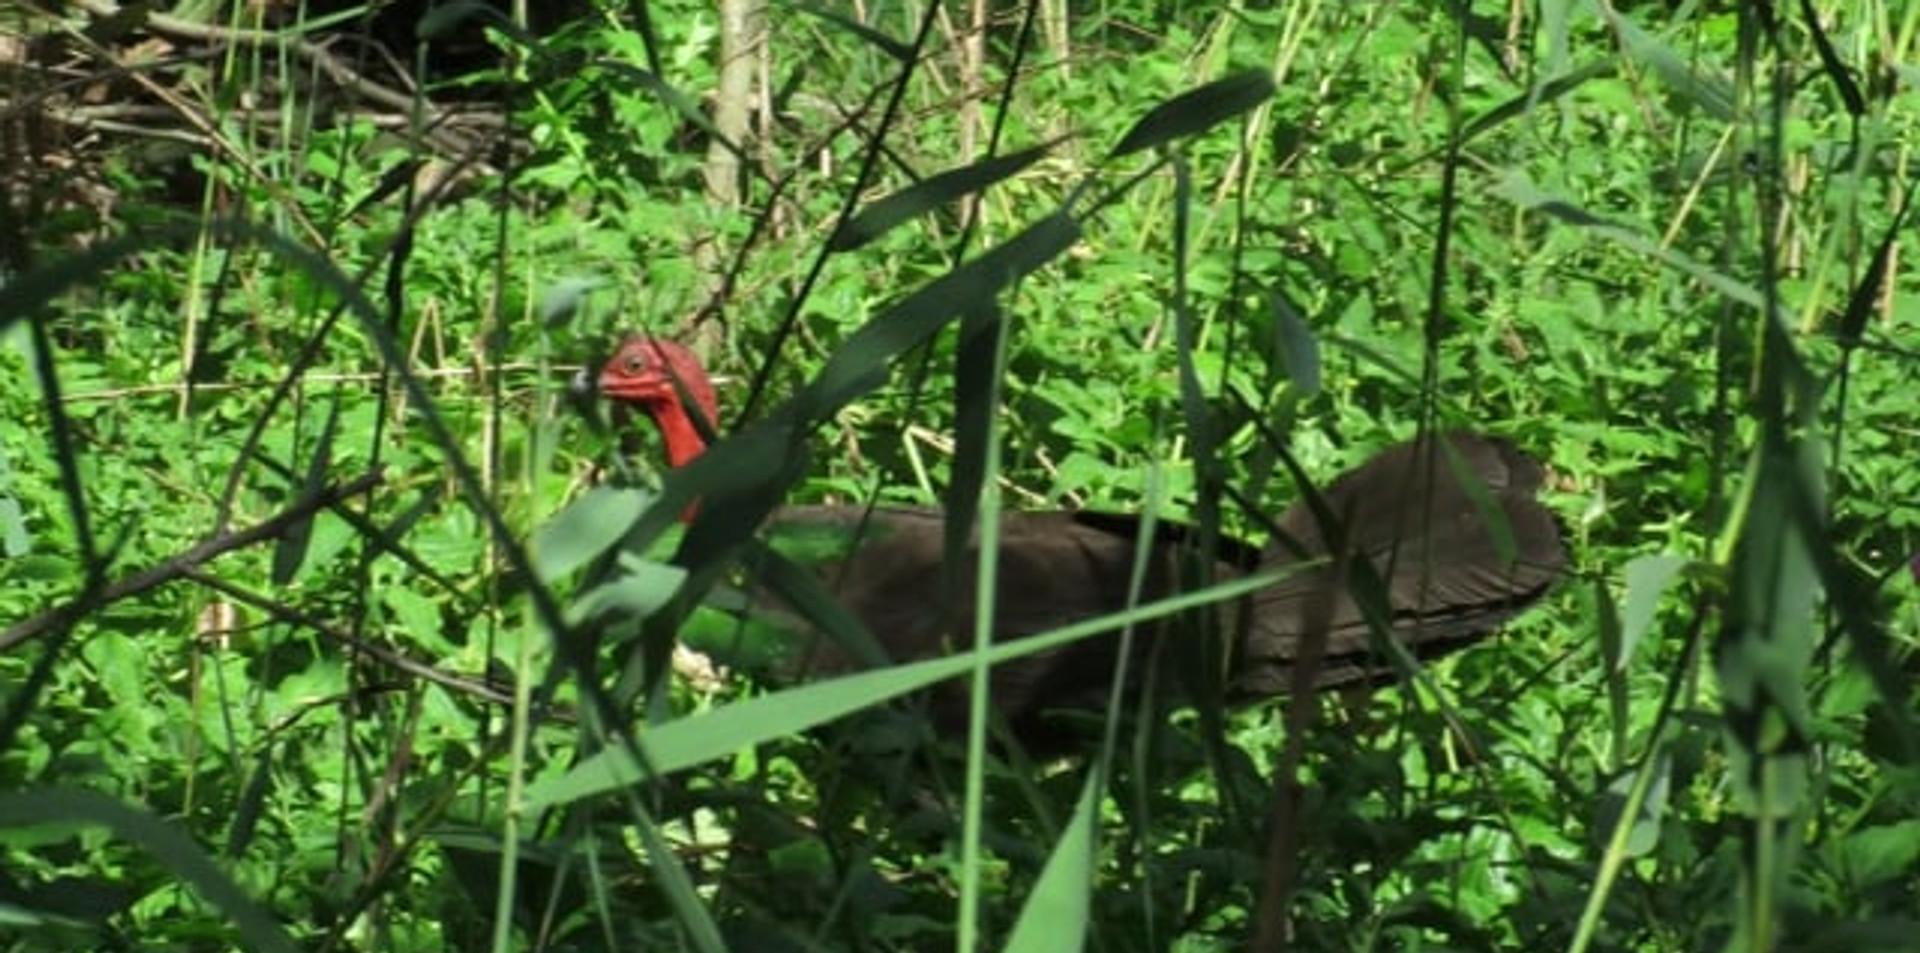 Adult male Australian Brush Turkey walking through vegetation